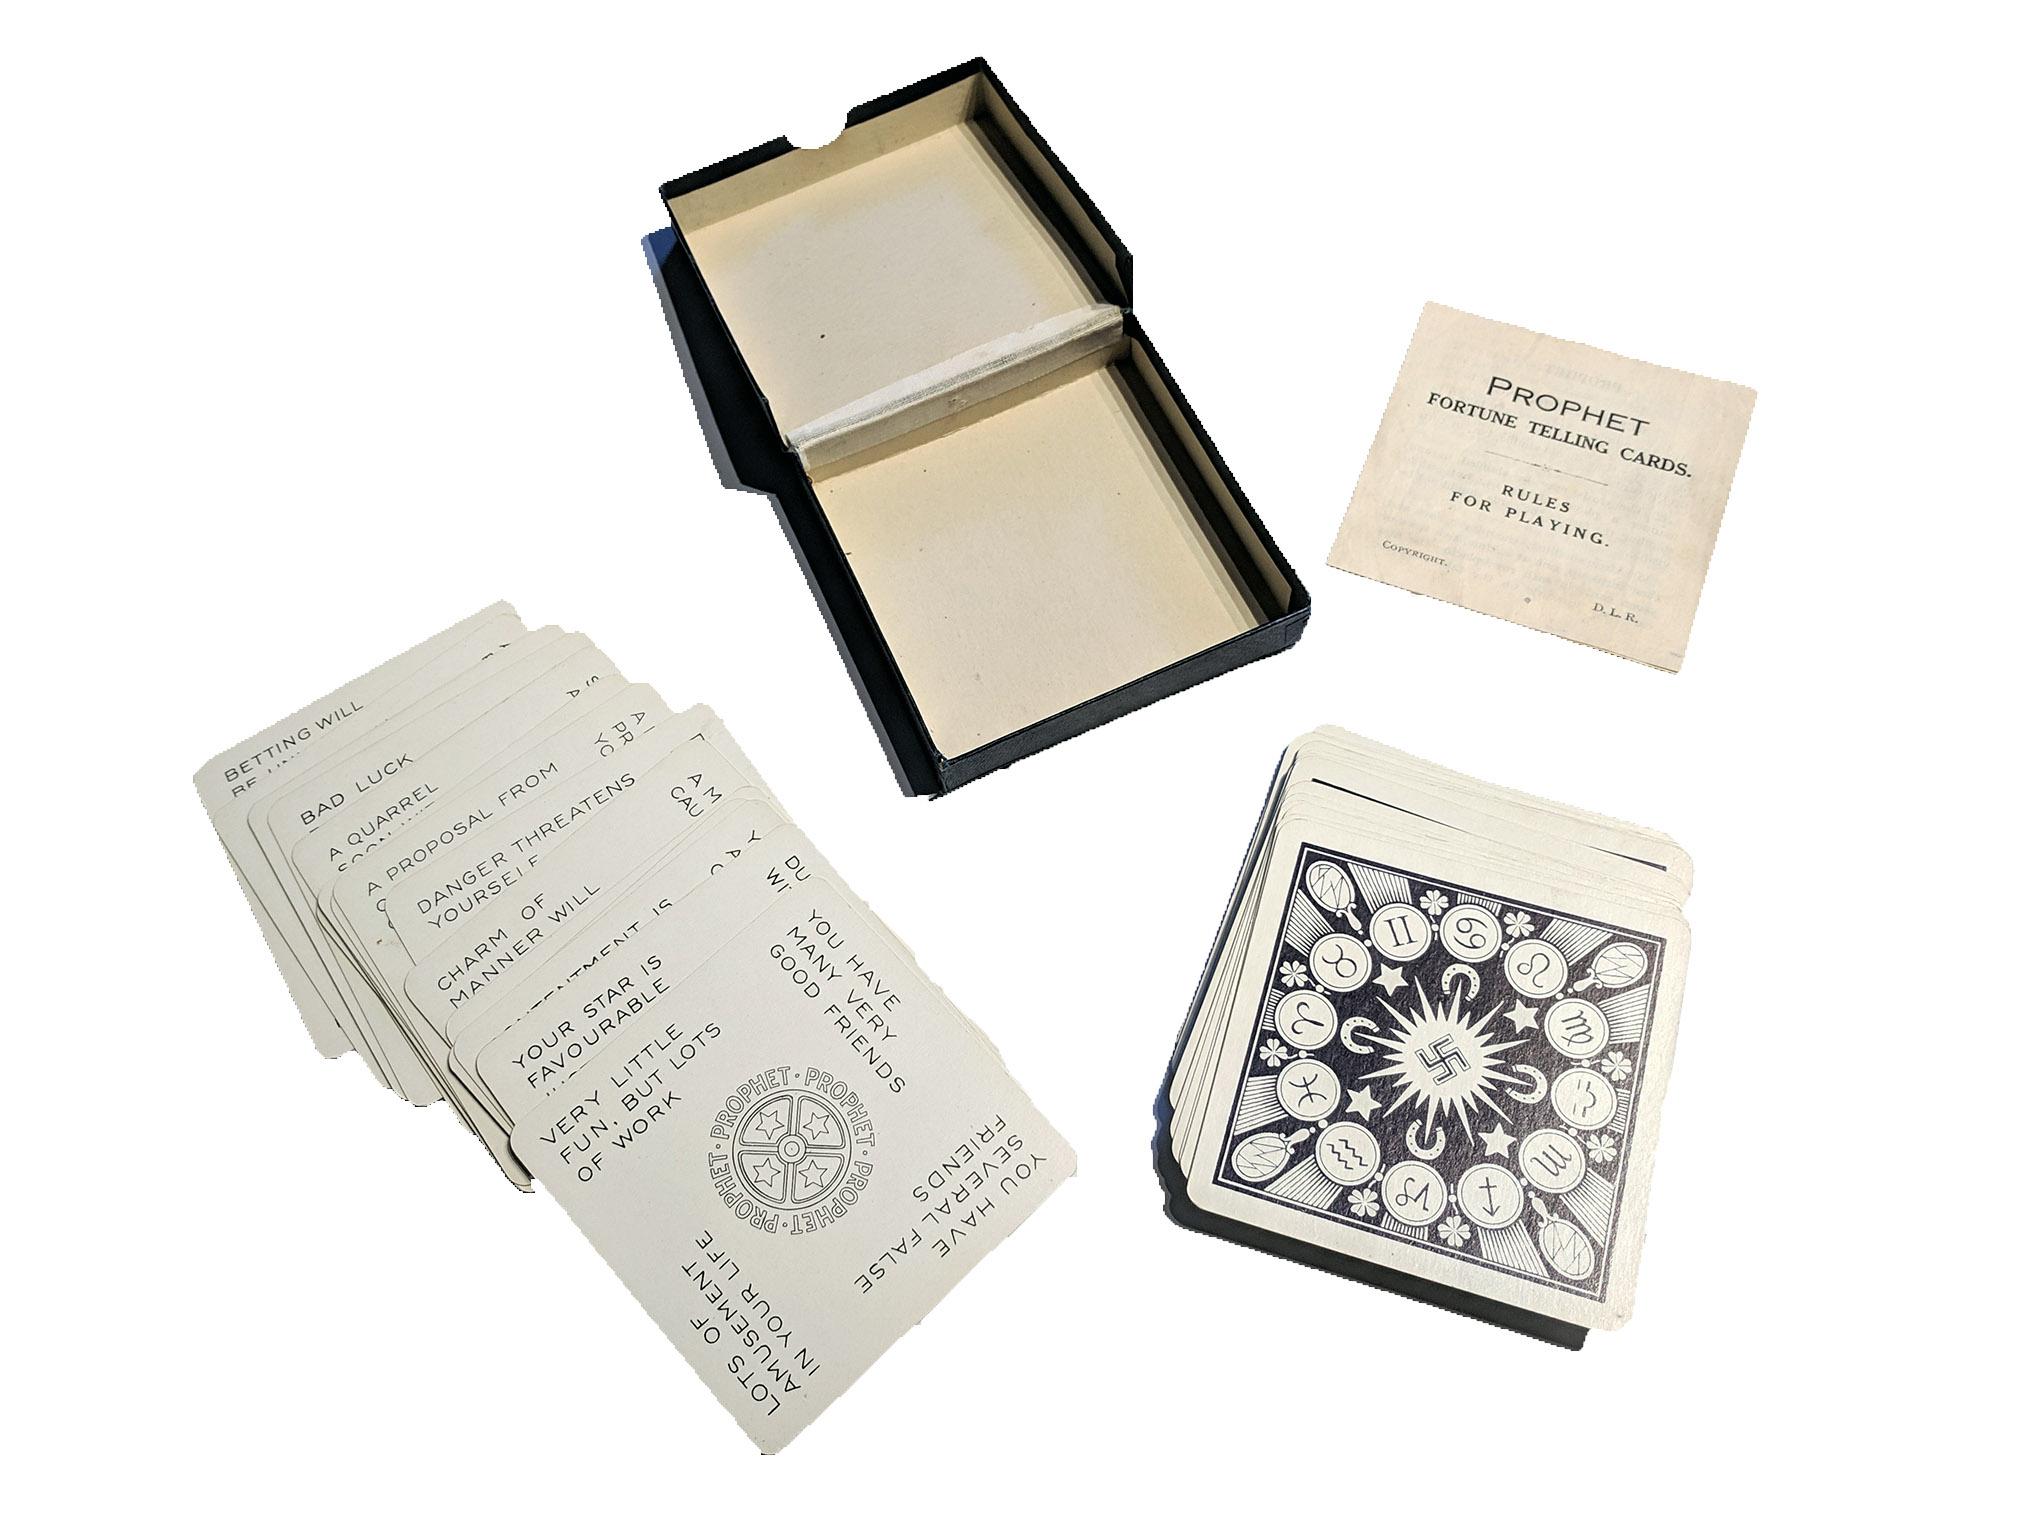 Prophet fortune cards (3).jpg